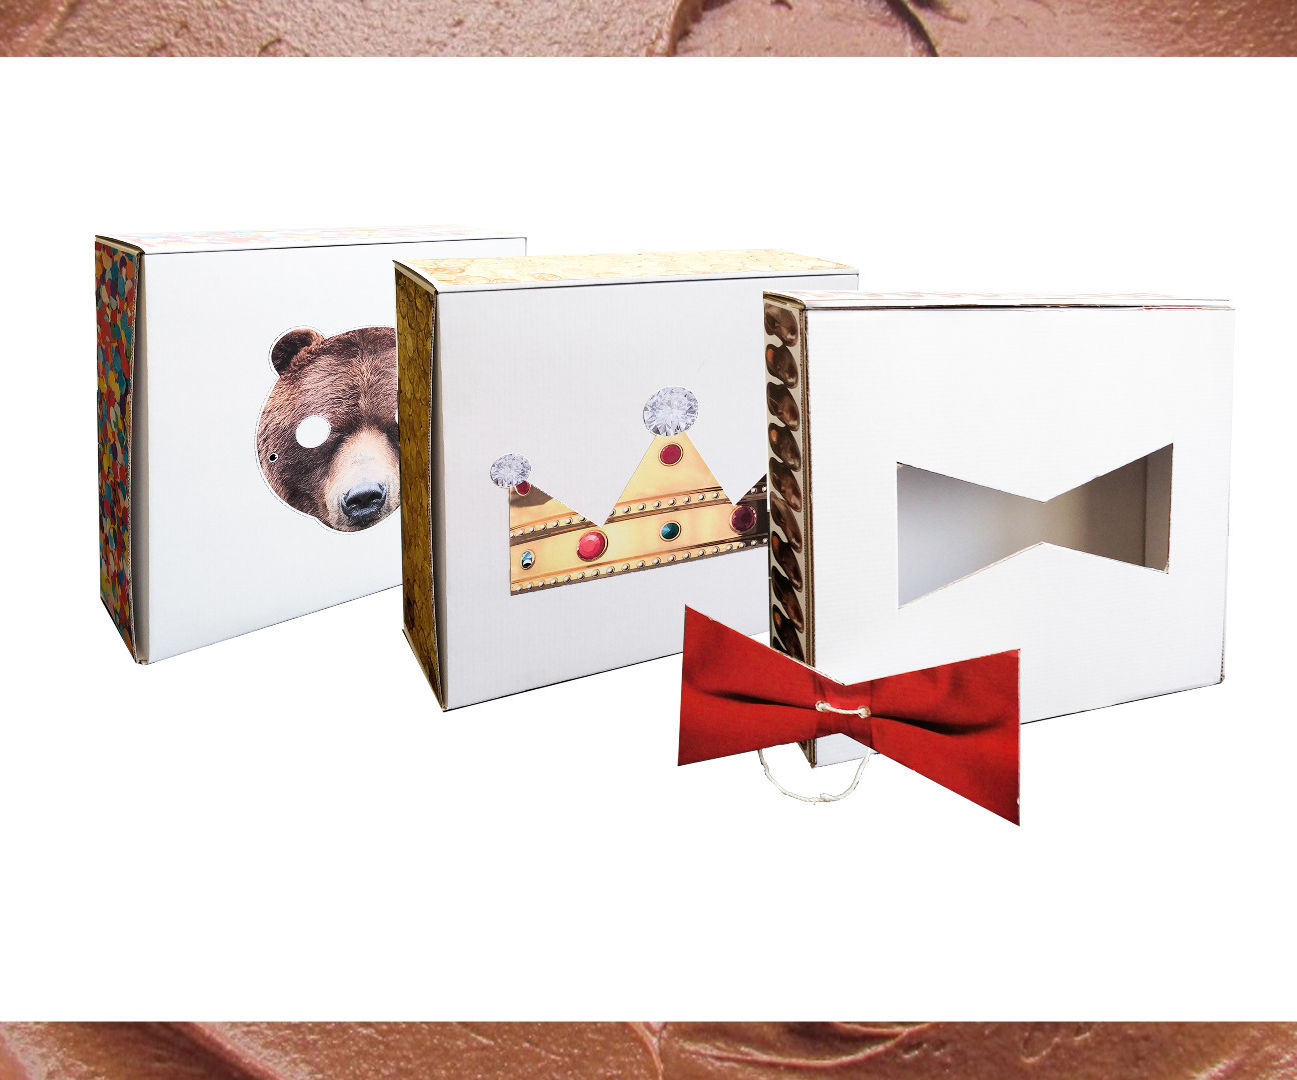 The Special Cake Box (Cardboard Box Transformation)